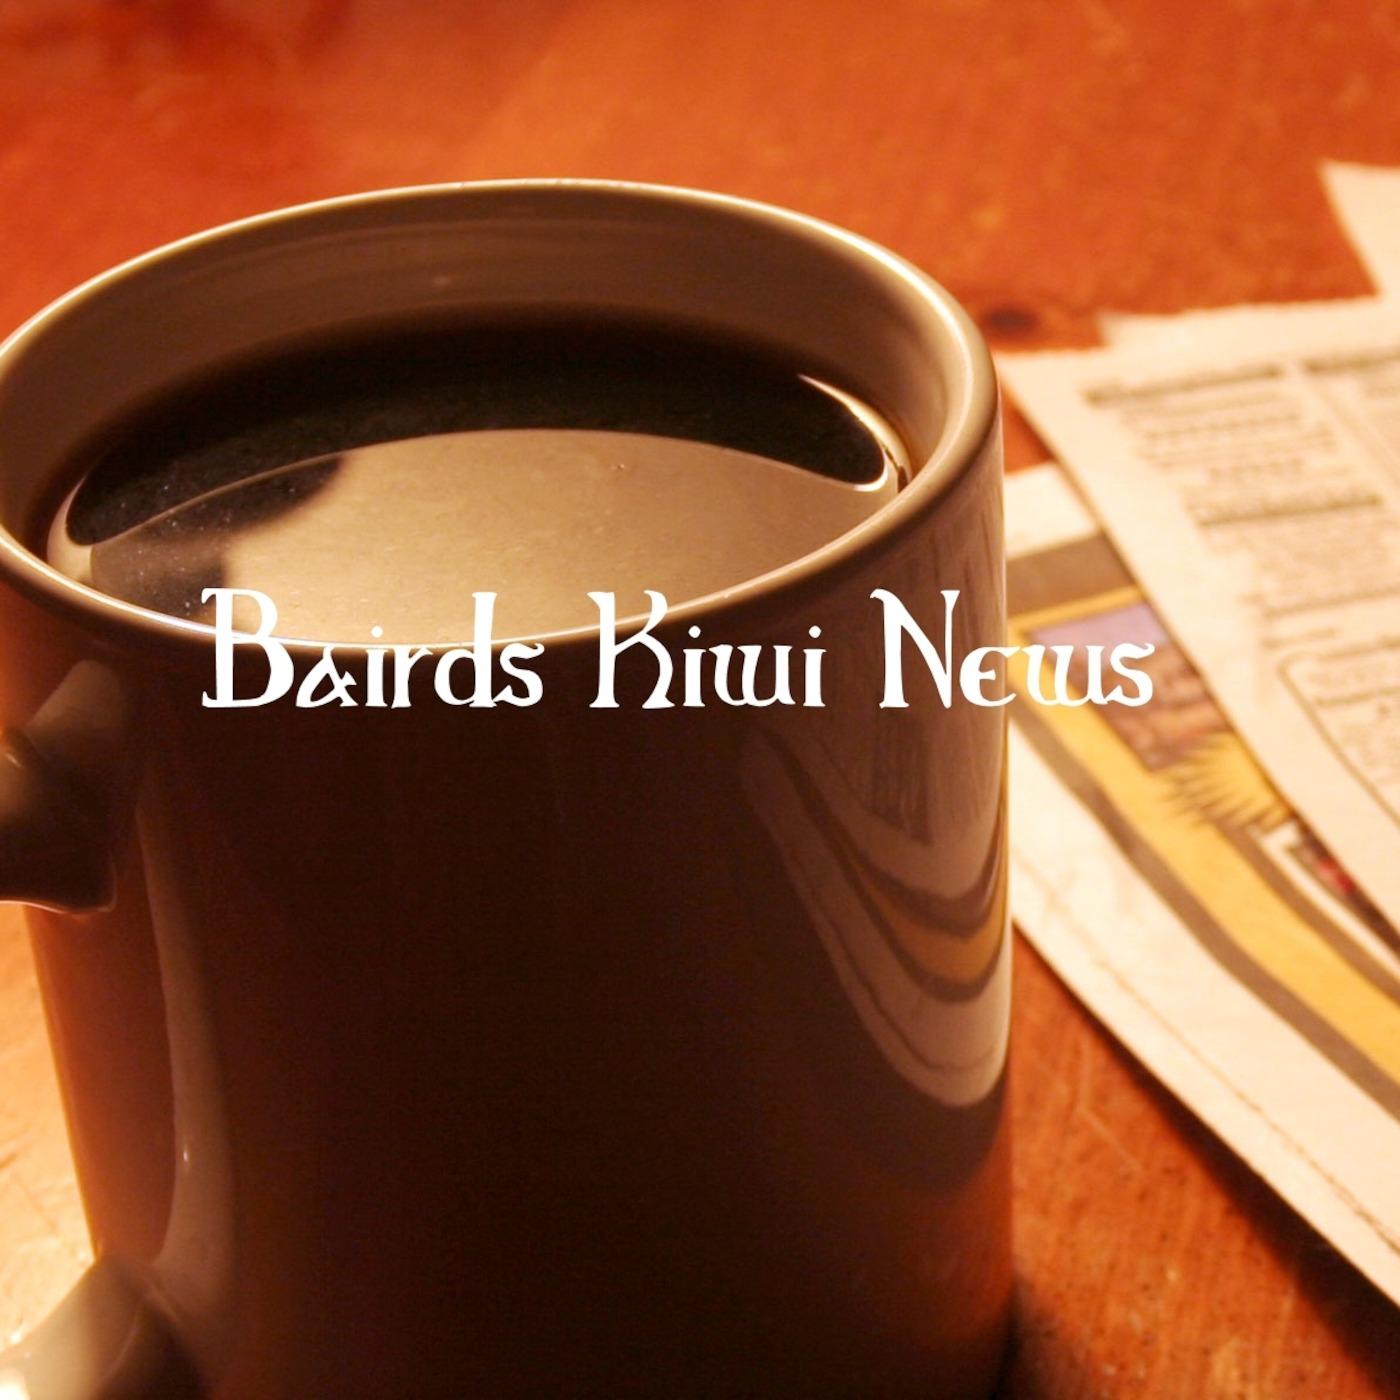 Bairds kiwi News' Podcast